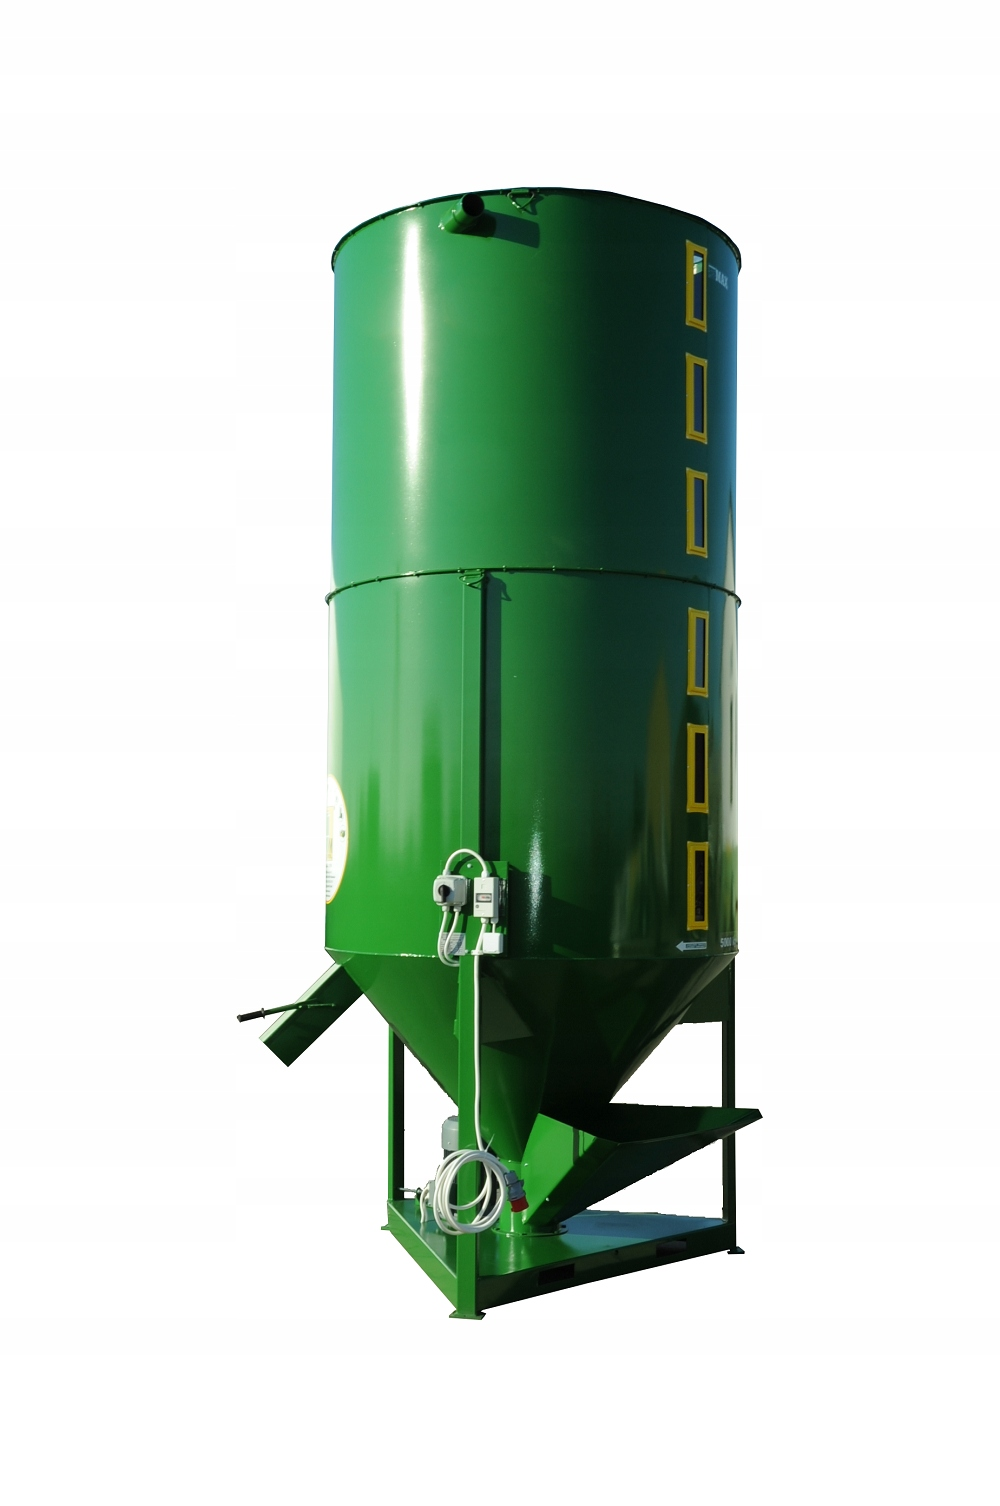 Mixér krmiva krmiva 4. M-ROL ROL. Nový